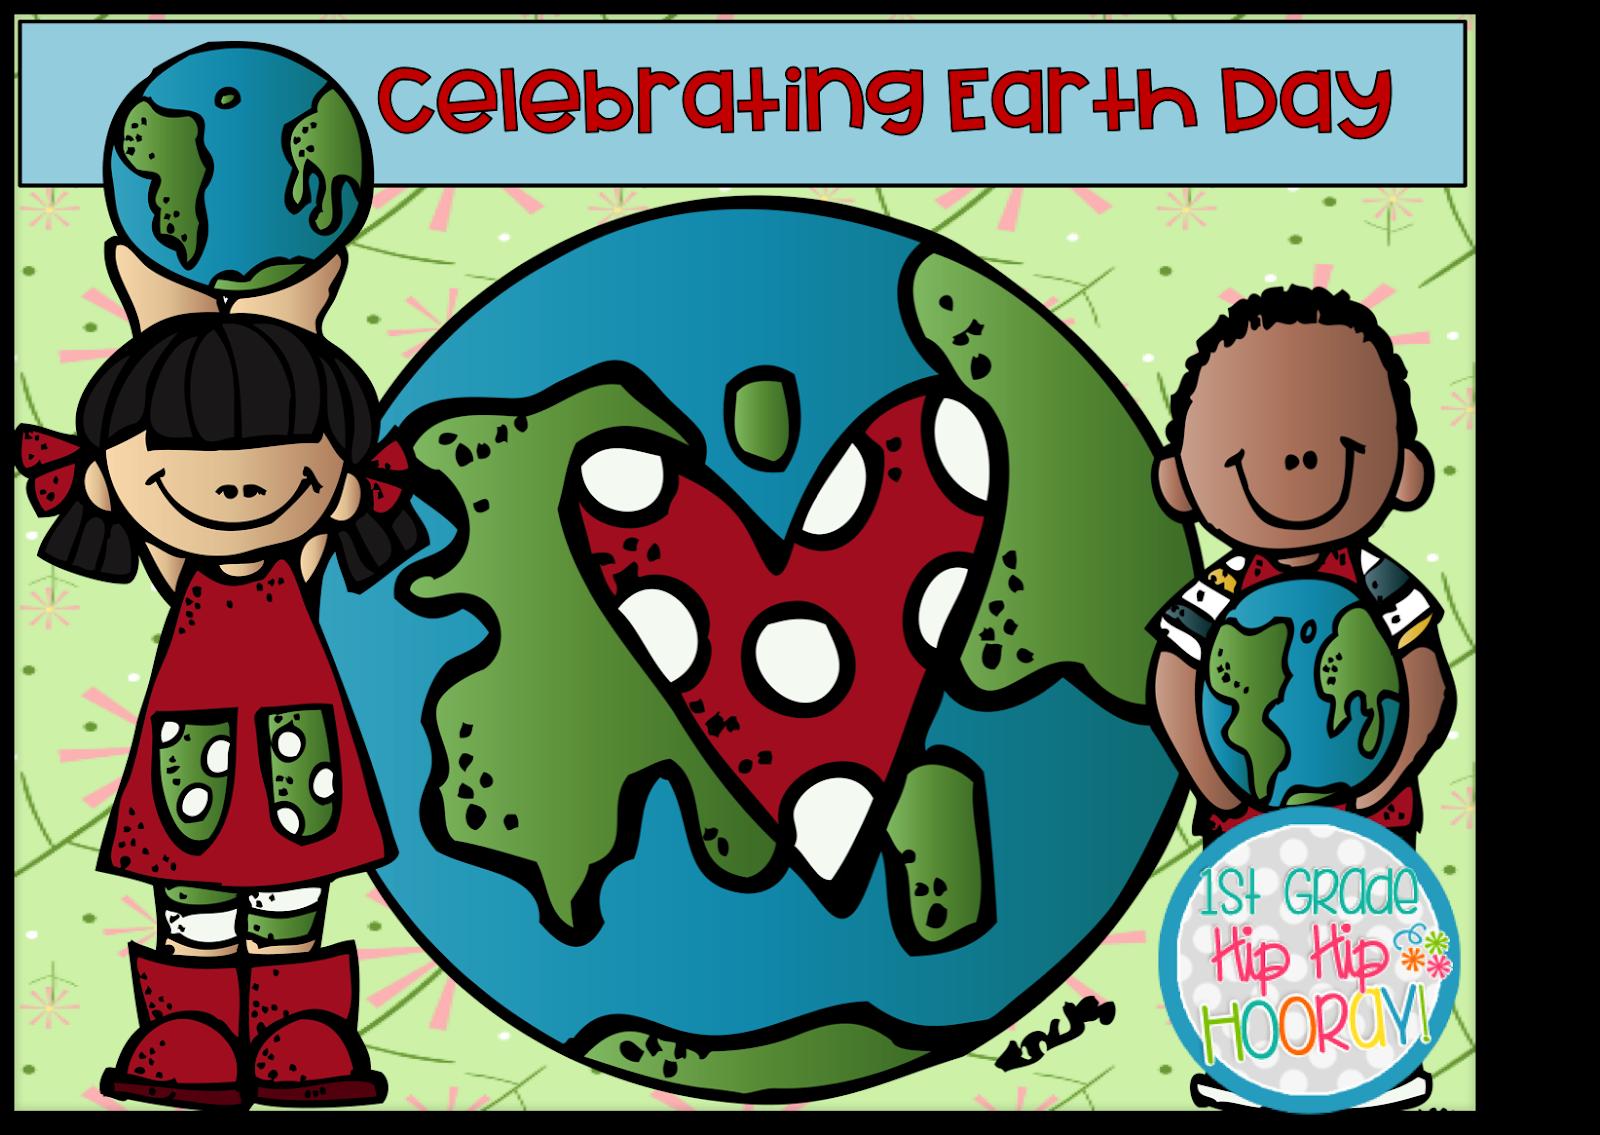 1st Grade Hip Hip Hooray Earth Day